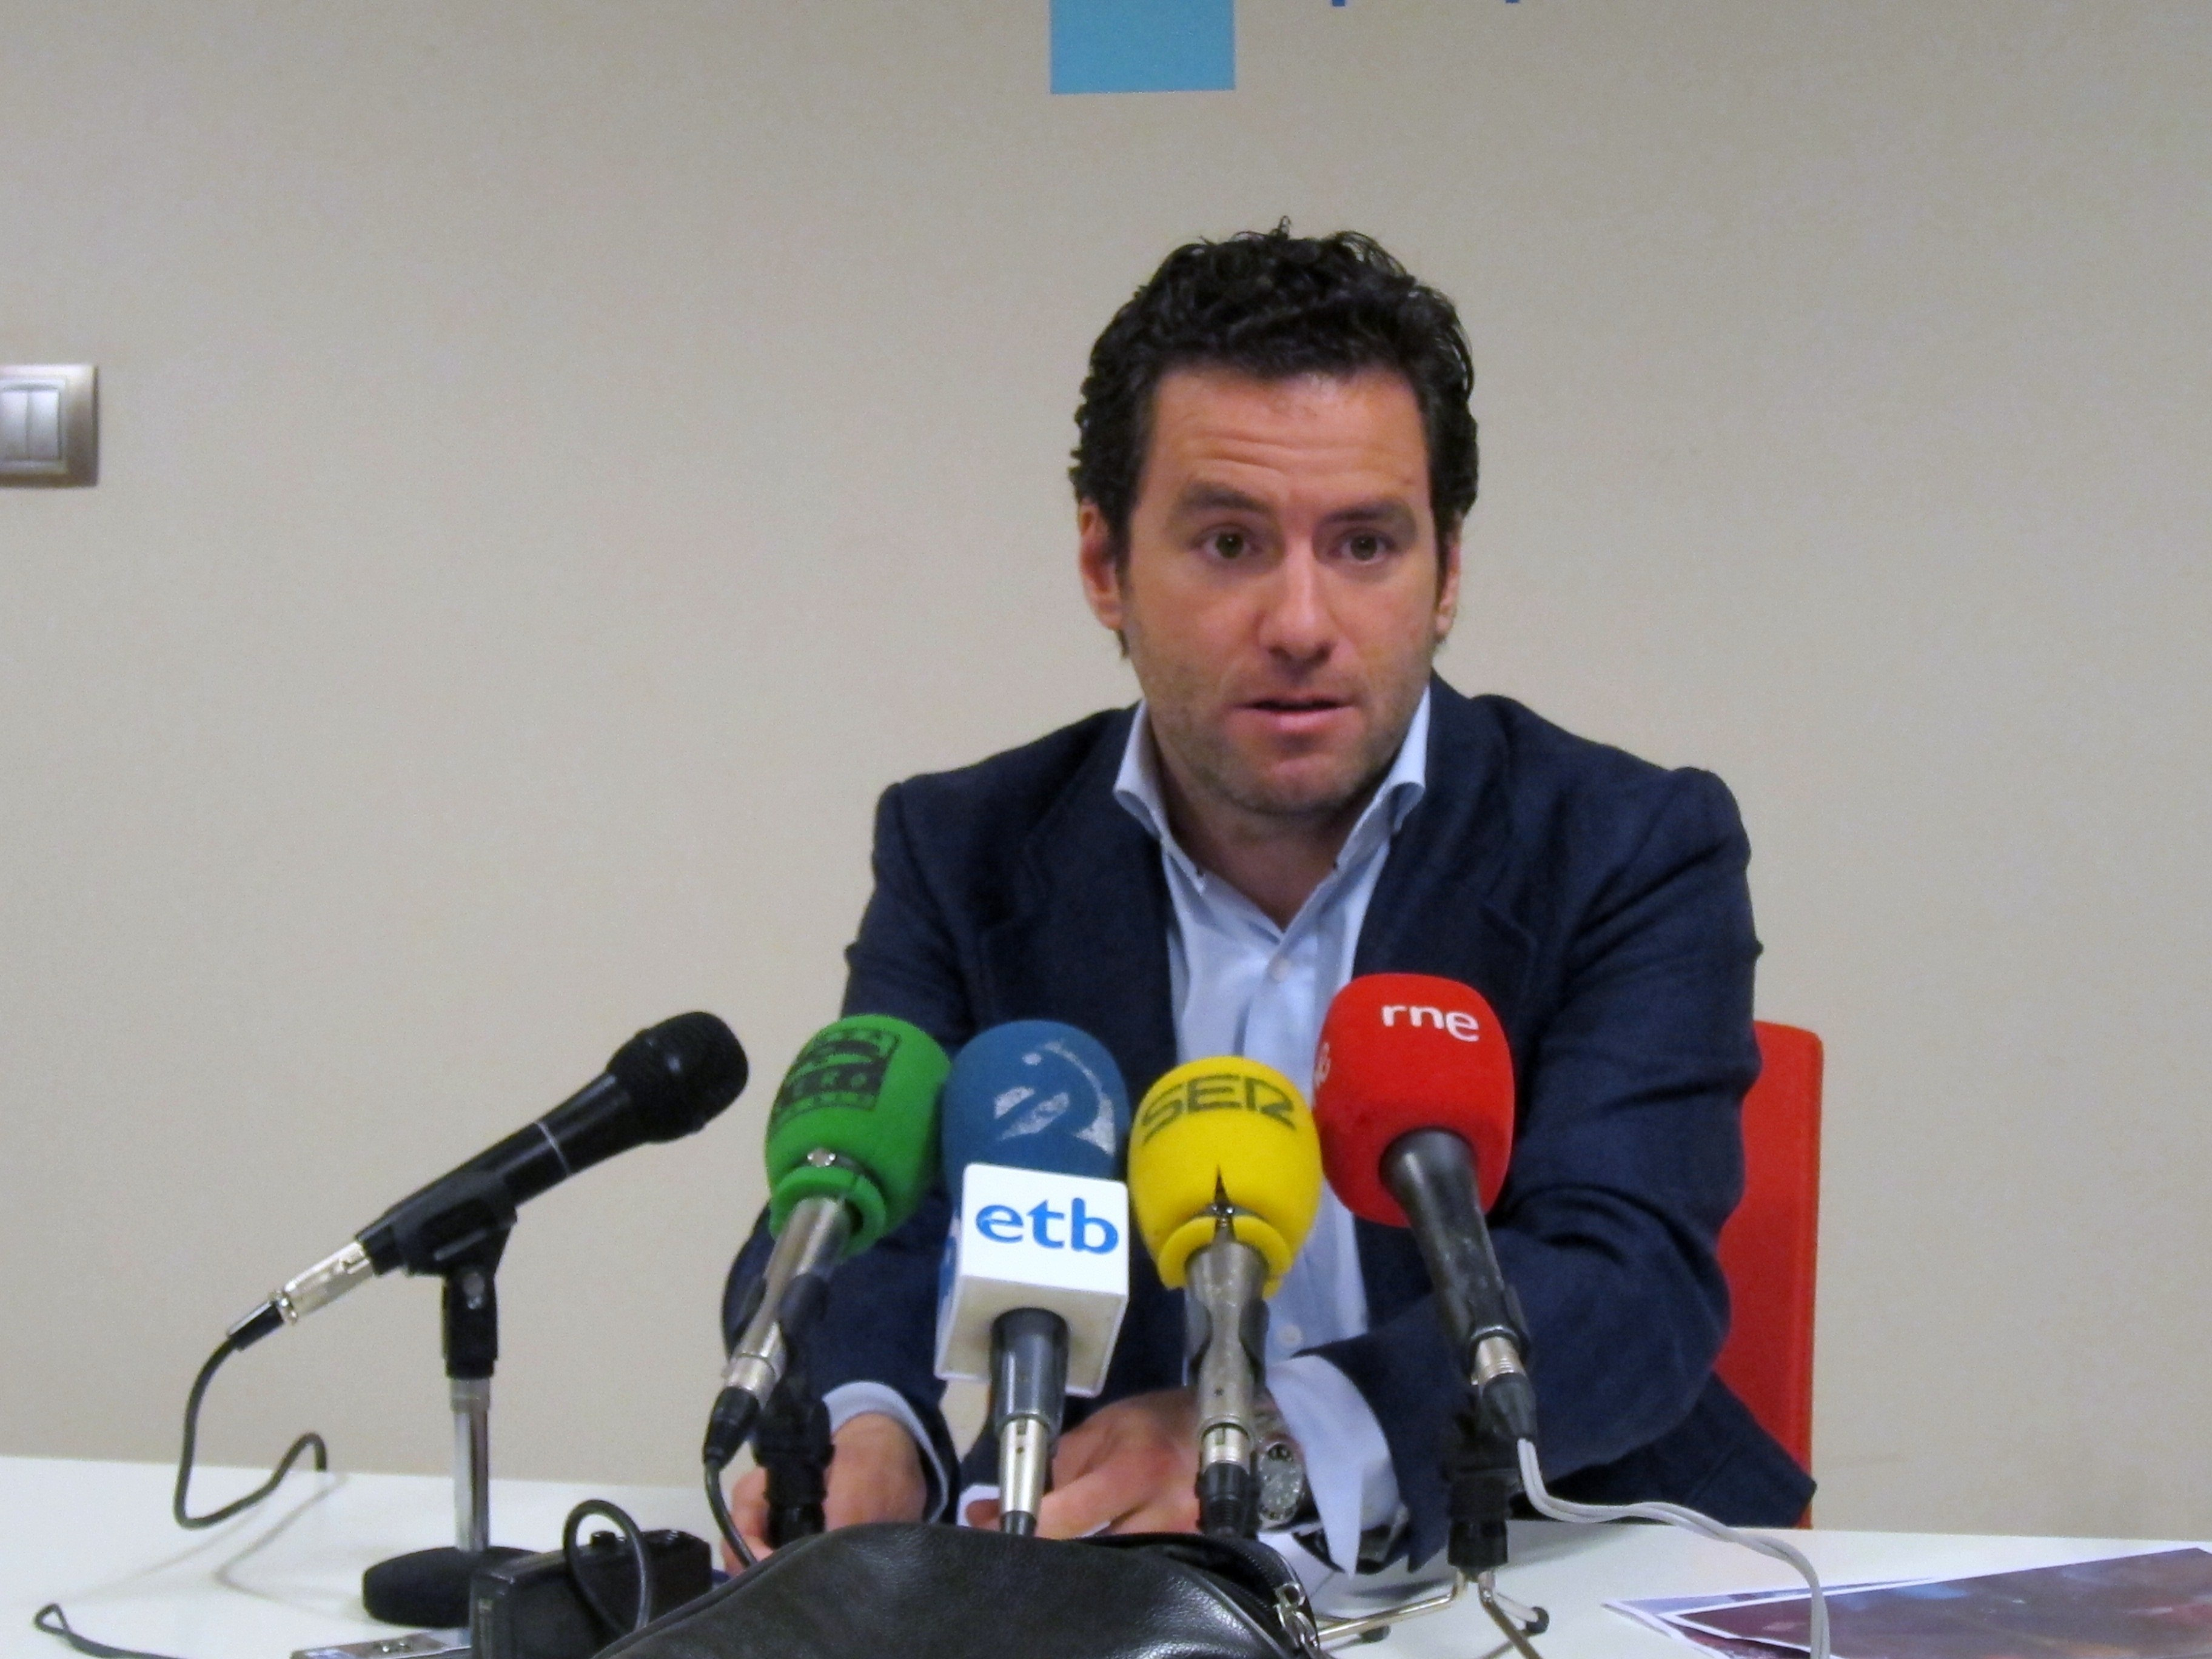 Sémper (PP) pide a Urkullu que reflexione sobre «la importancia de un acuerdo a tres» entre PNV, PSE y PP